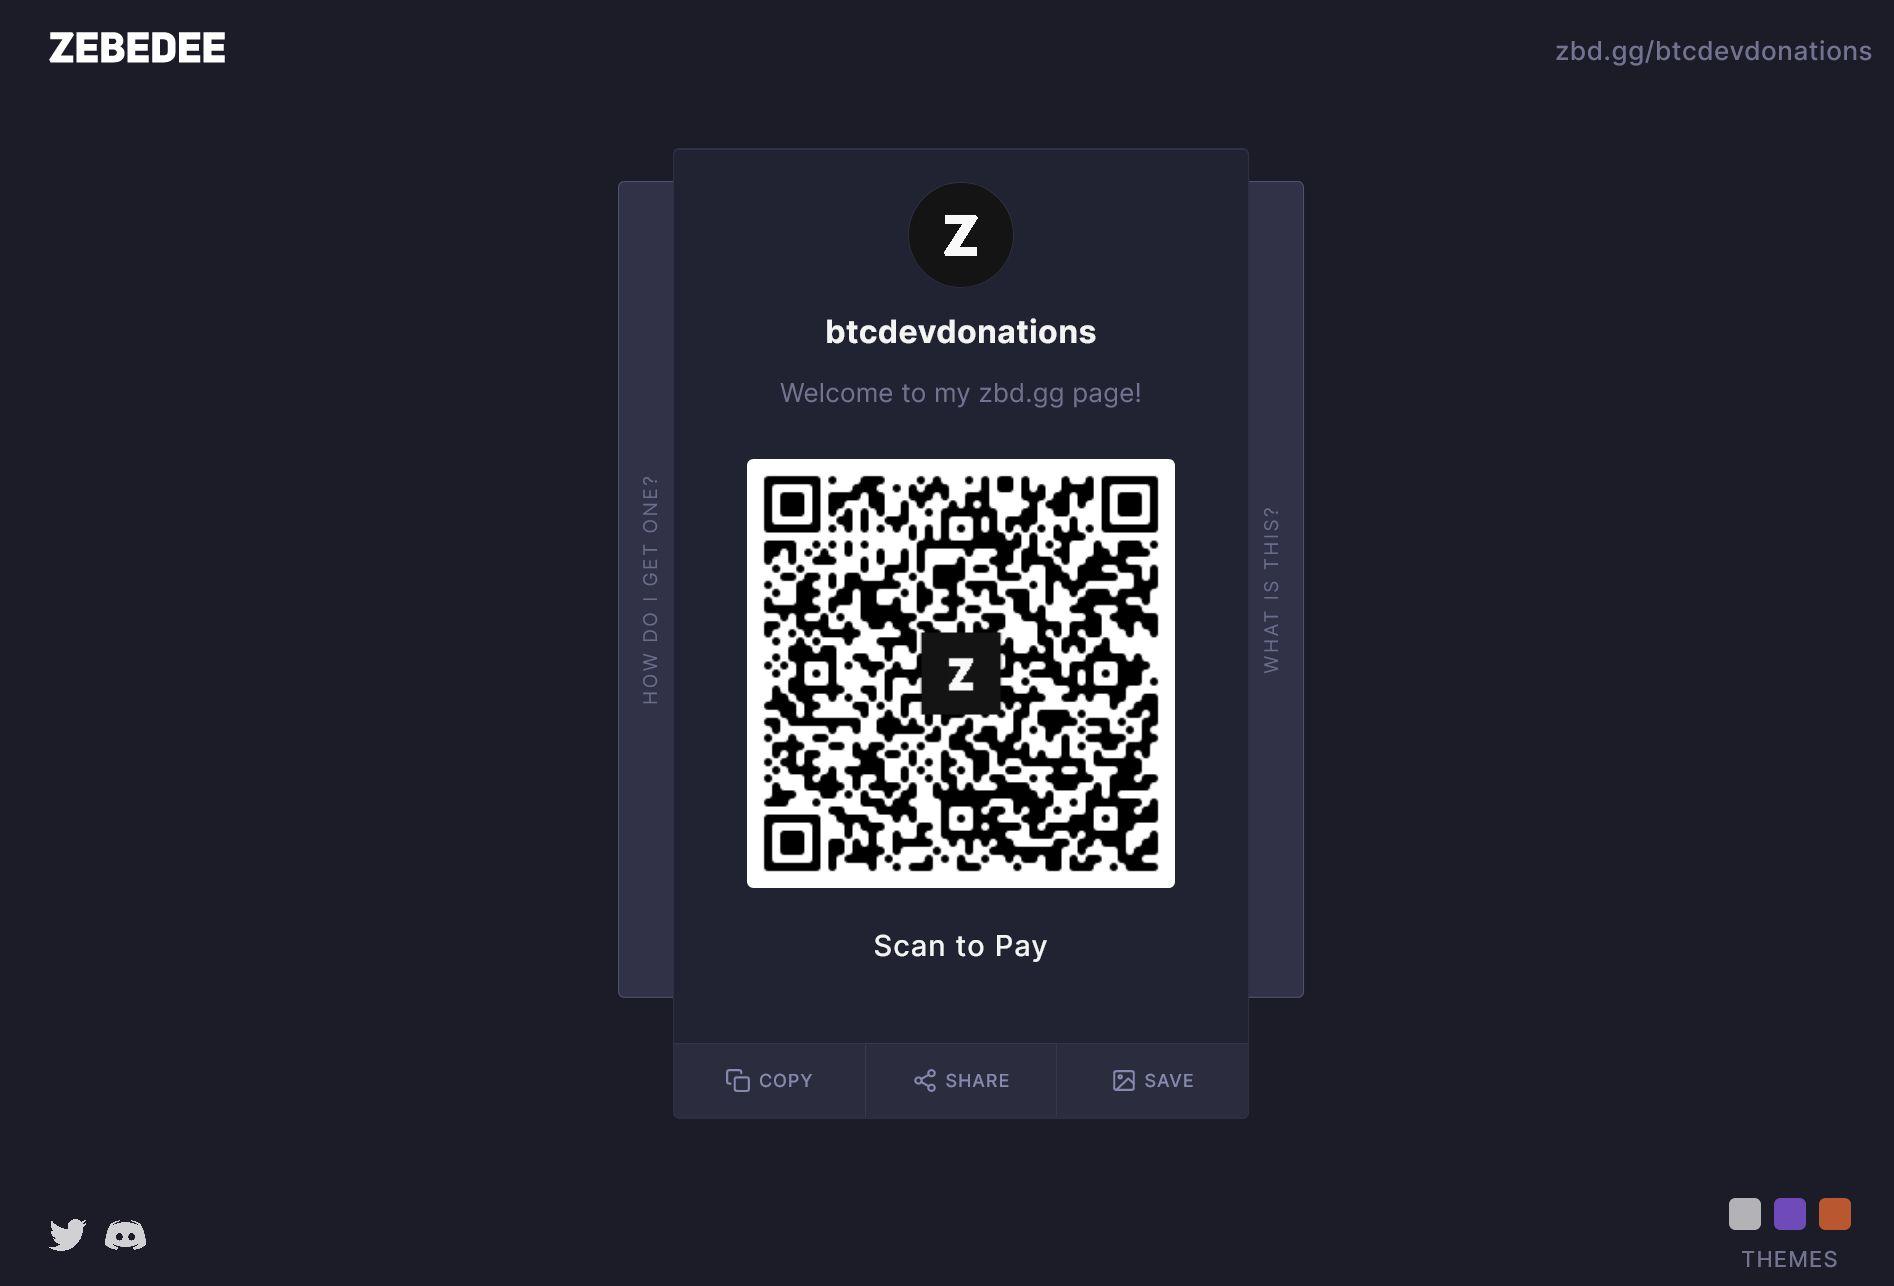 Bitcoin developer donations Gamertag profile page on zbd.gg